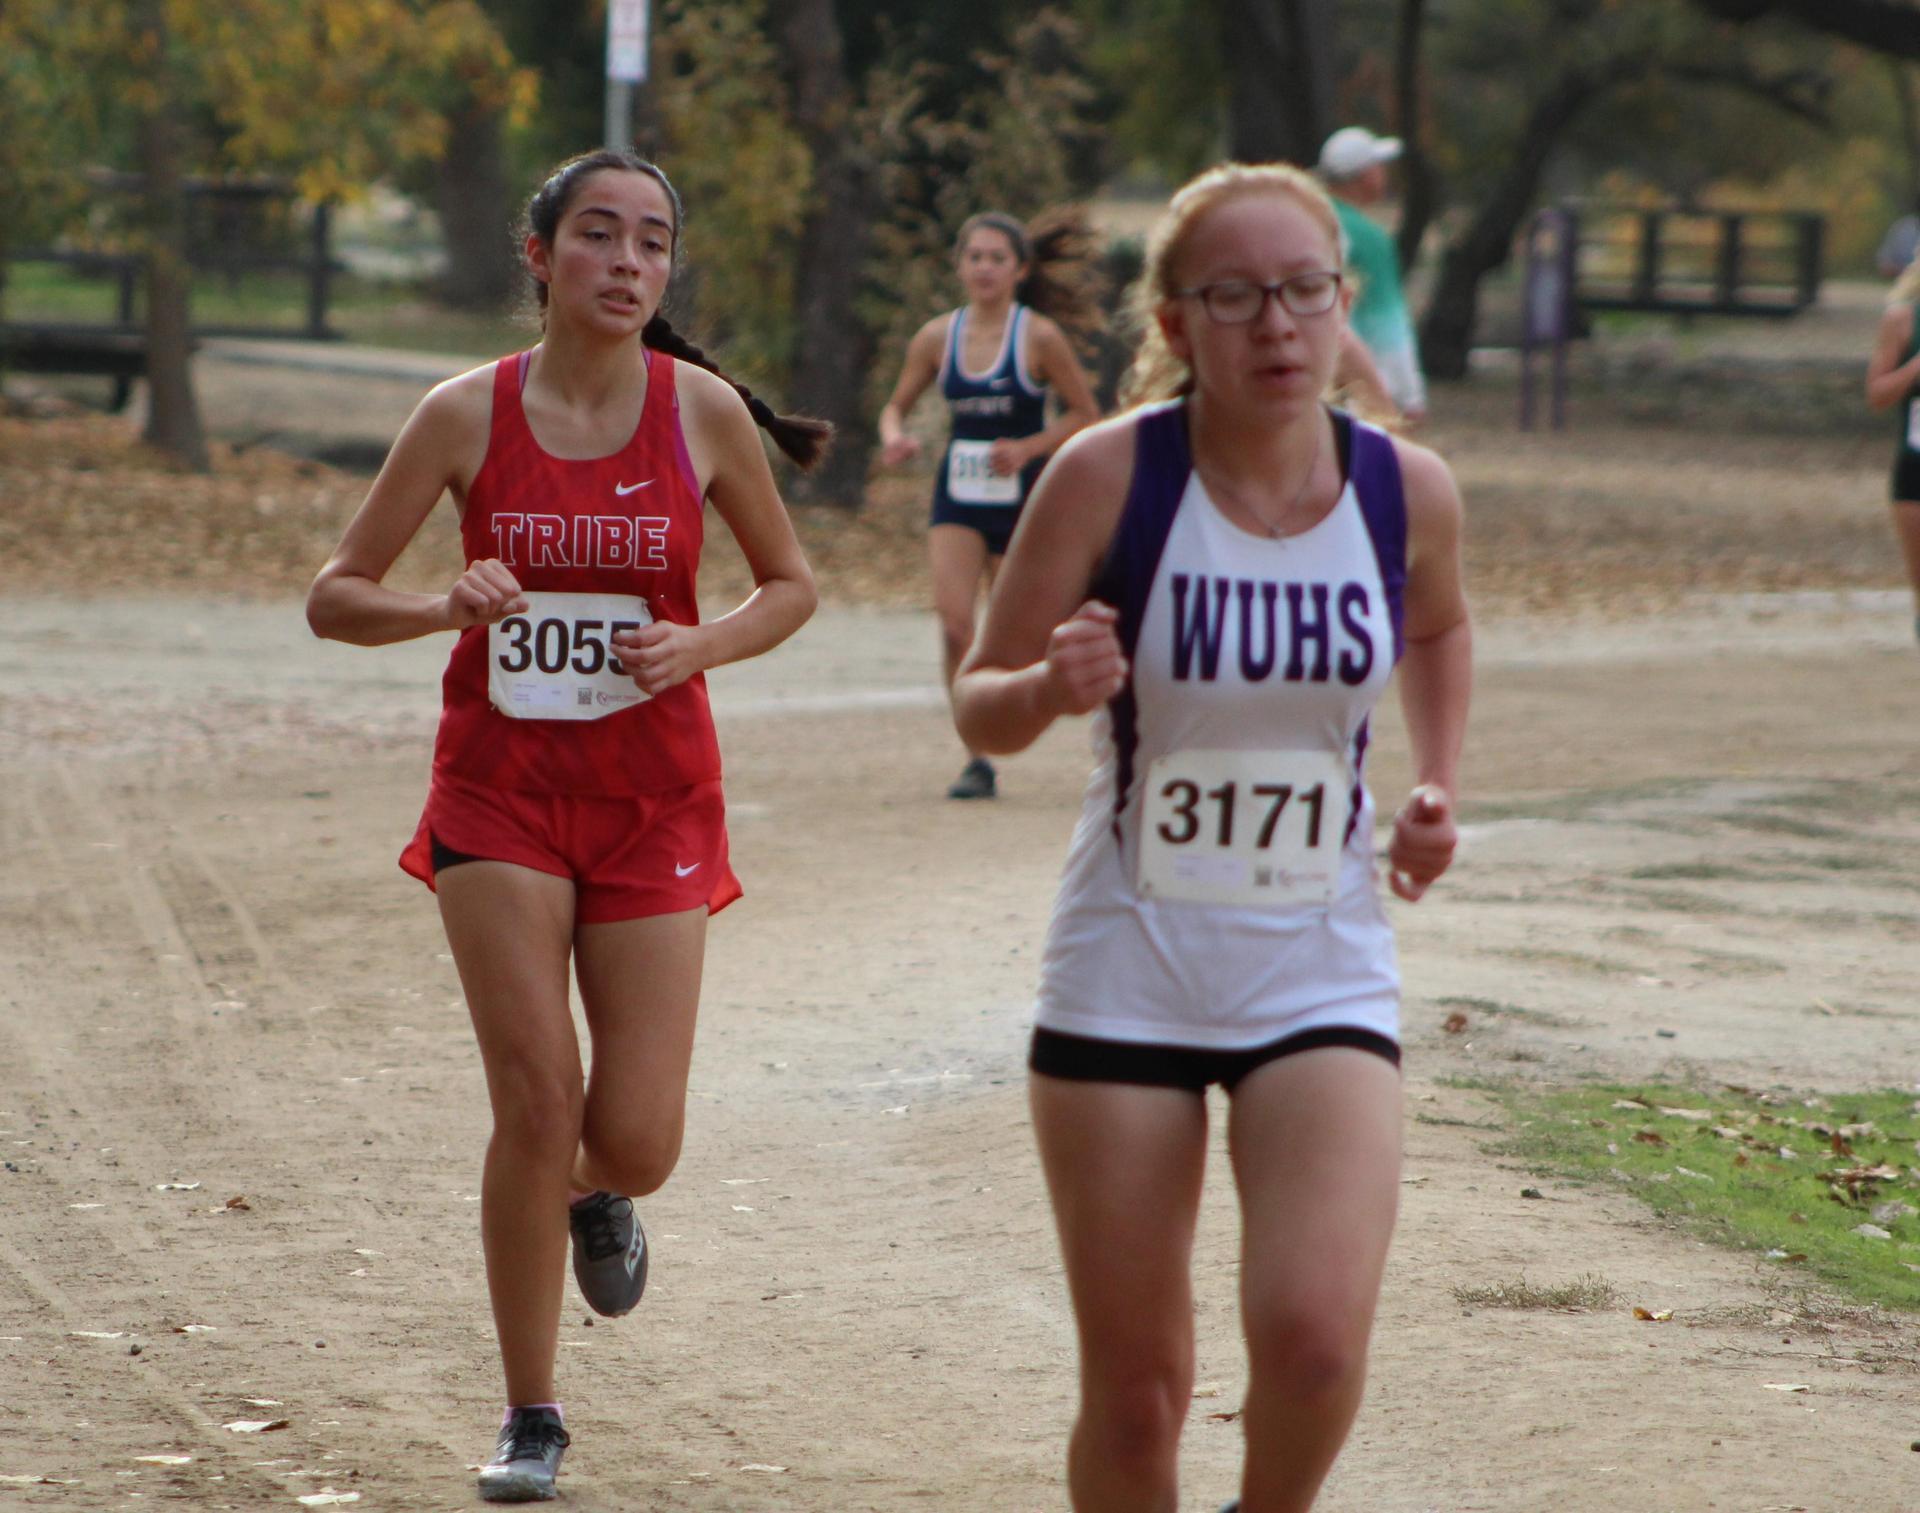 Lizeth Solorzano leading the race